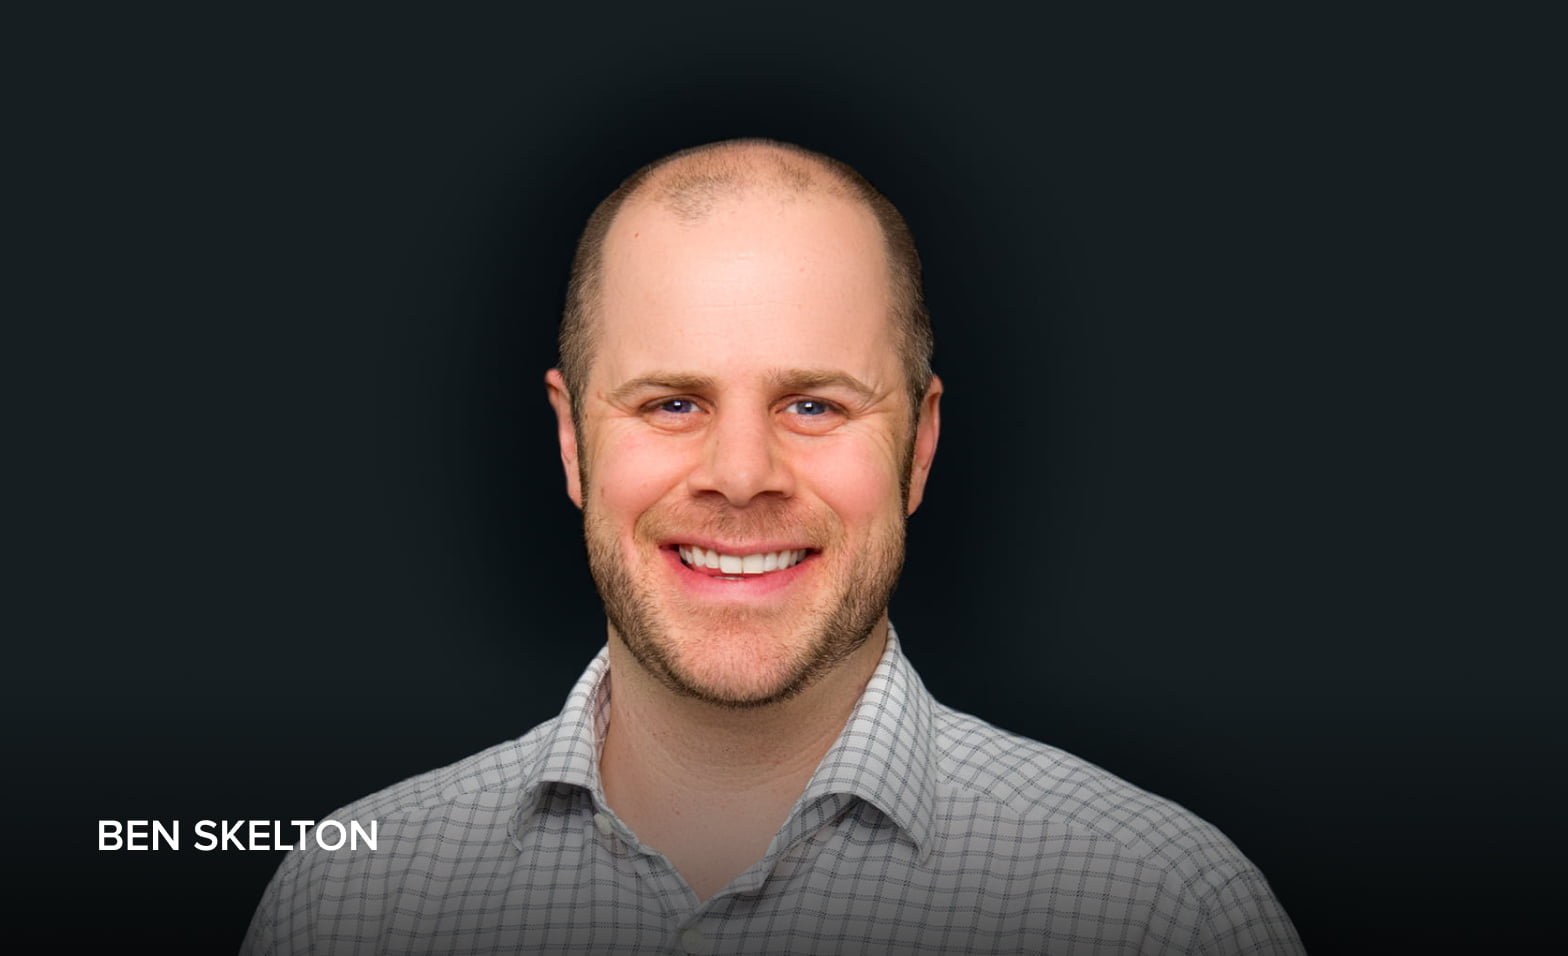 A headshot of Ben Skelton, Vice President